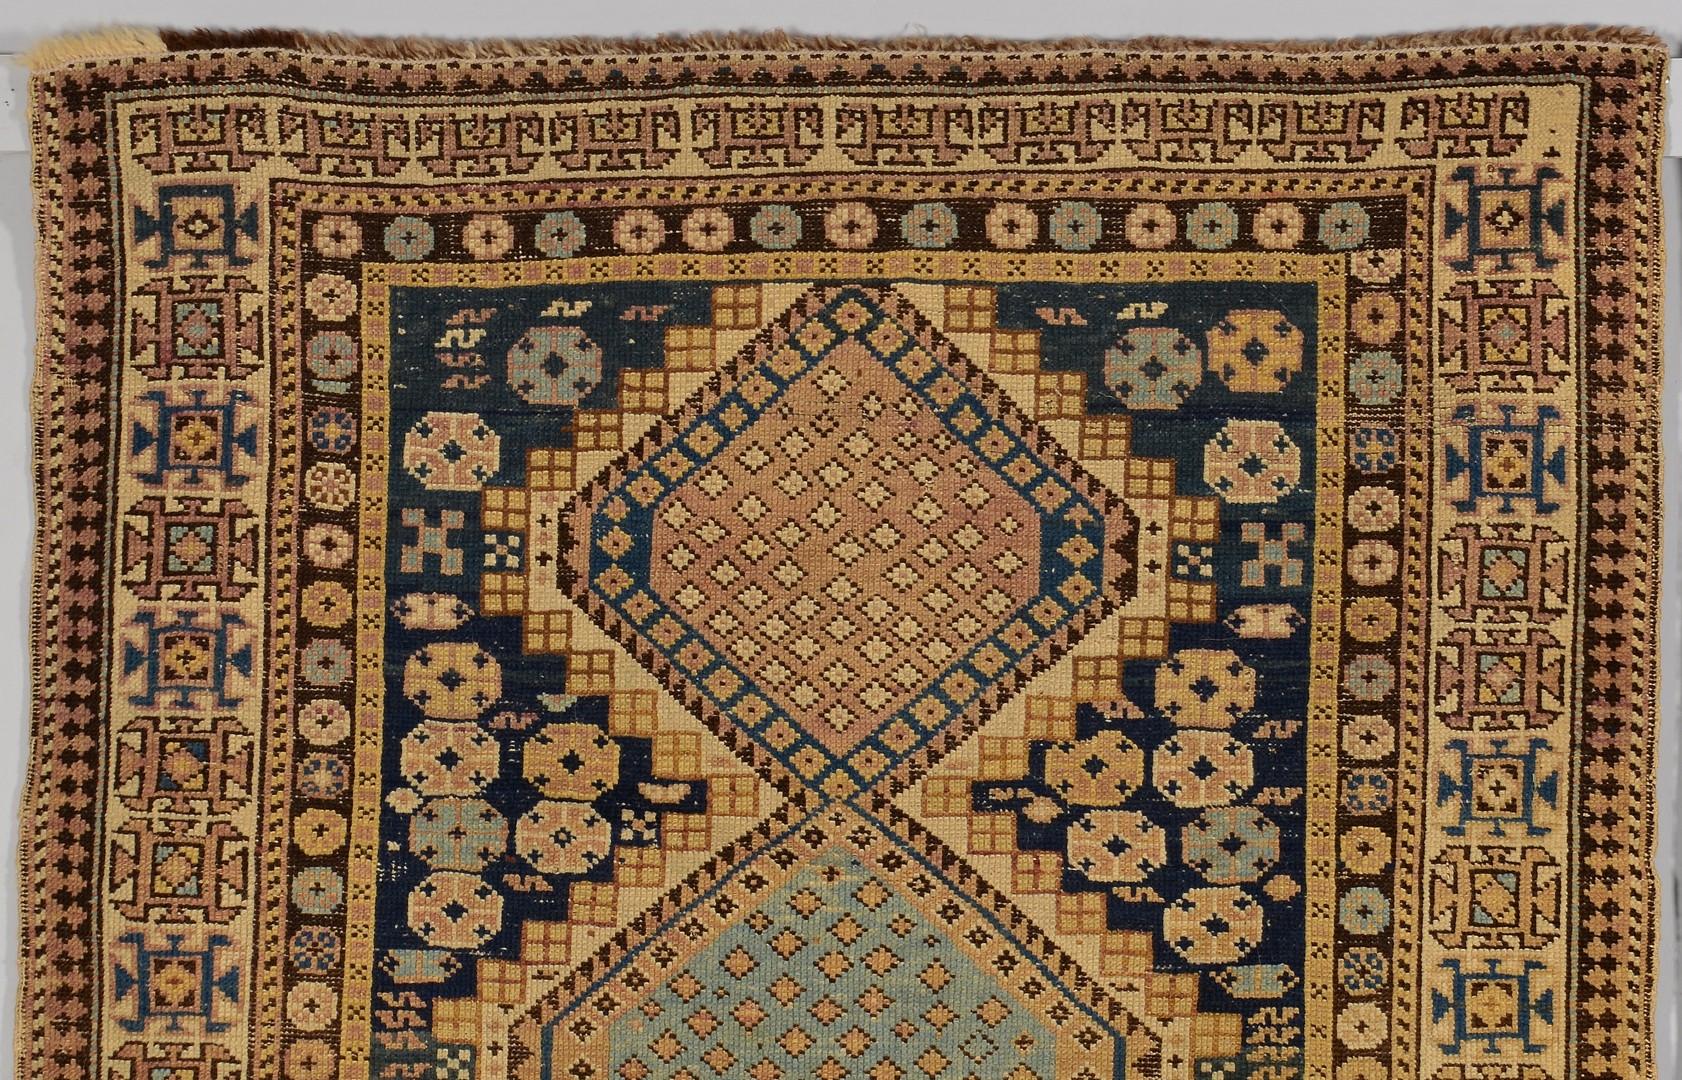 Lot 908: Shirvan and Kuba Caucasus area rugs